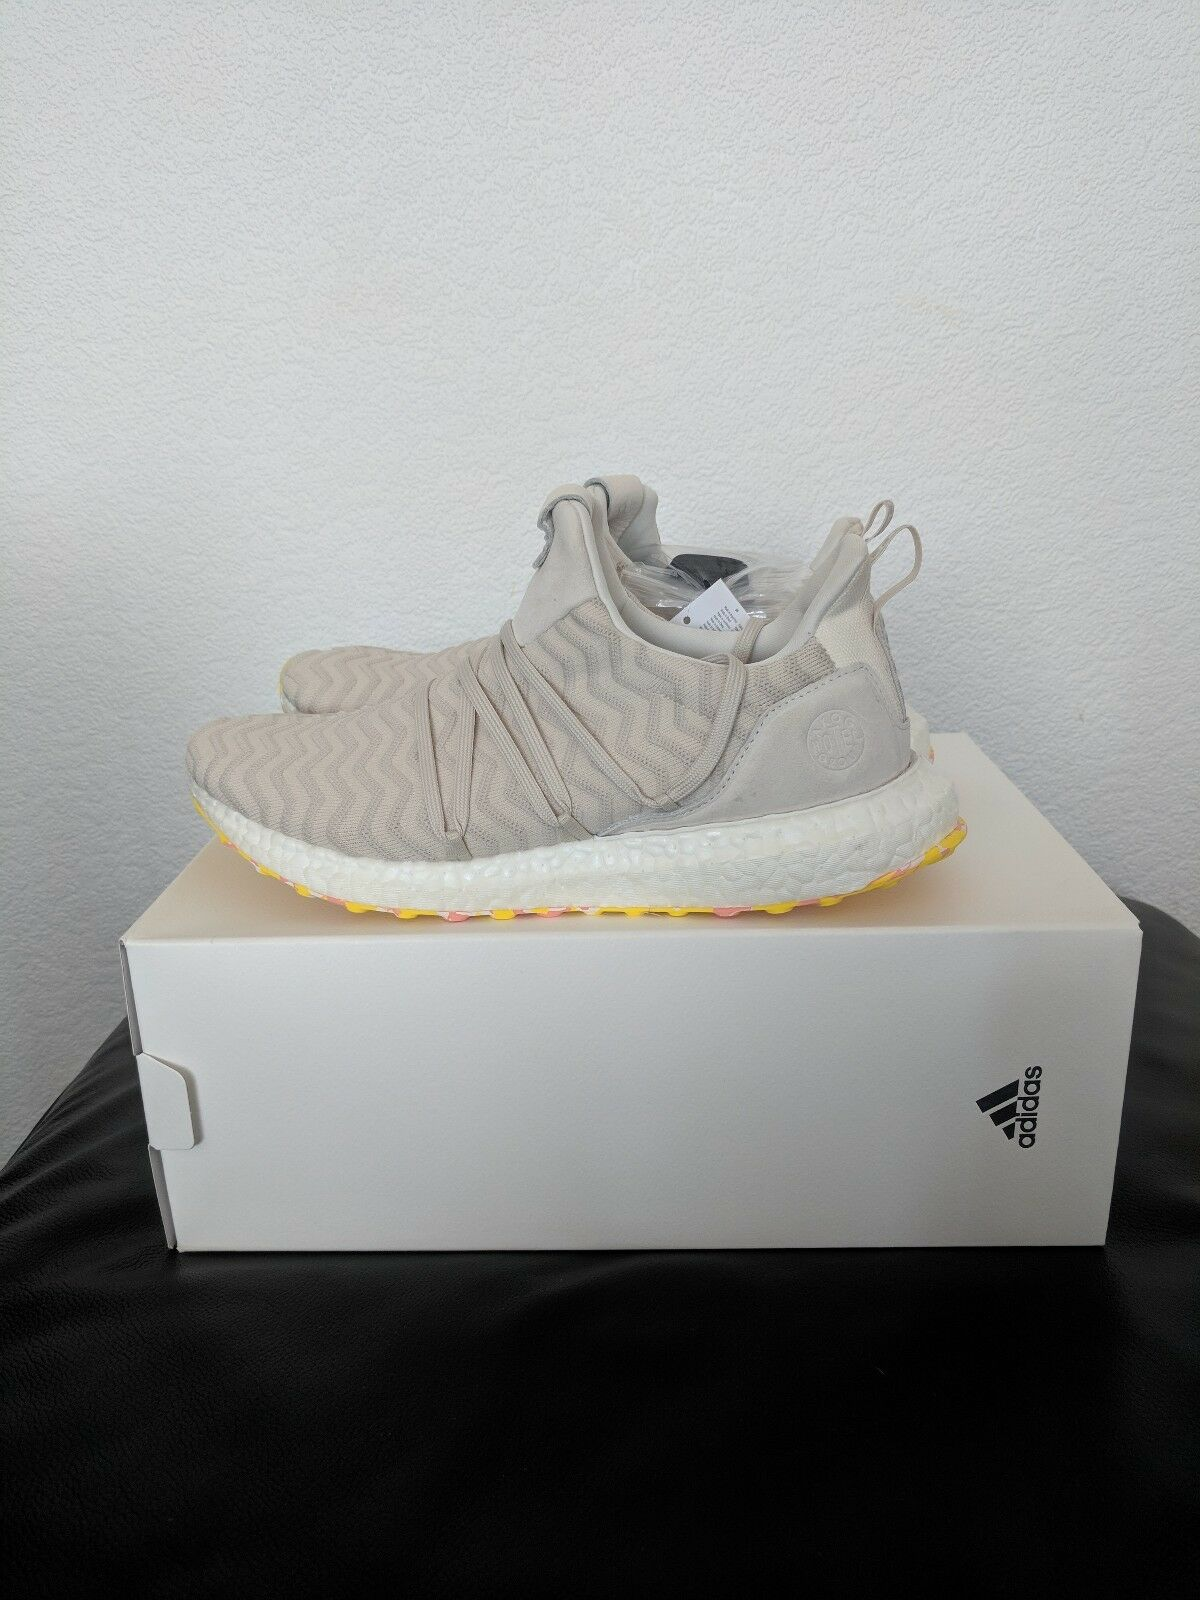 Adidas x A Kind Of Guise Ultra Bottes blanc   - Beige blanc Bottes & Yellow UK8 ec211a